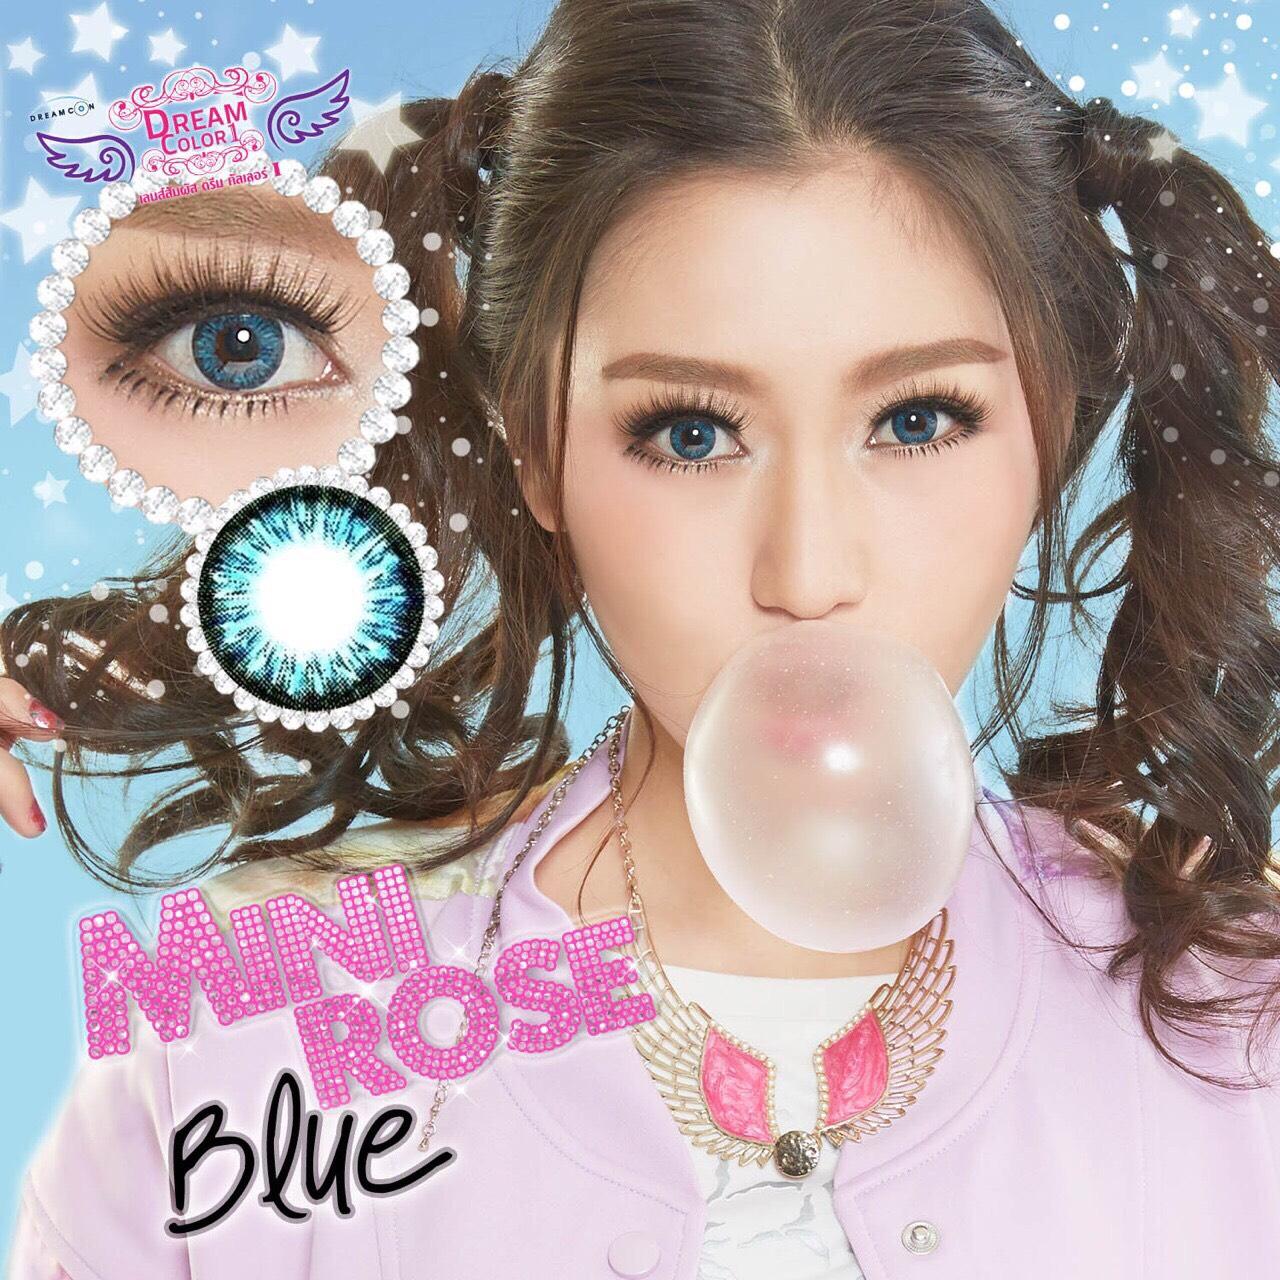 Mini Rose Blue Dreamcolor1เลนส์นิ่มใส่สบาย คอนแทคเลนส์ ขายส่งคอนแทคเลนส์ ขายส่งBigeye Bigeyeเกาหลี